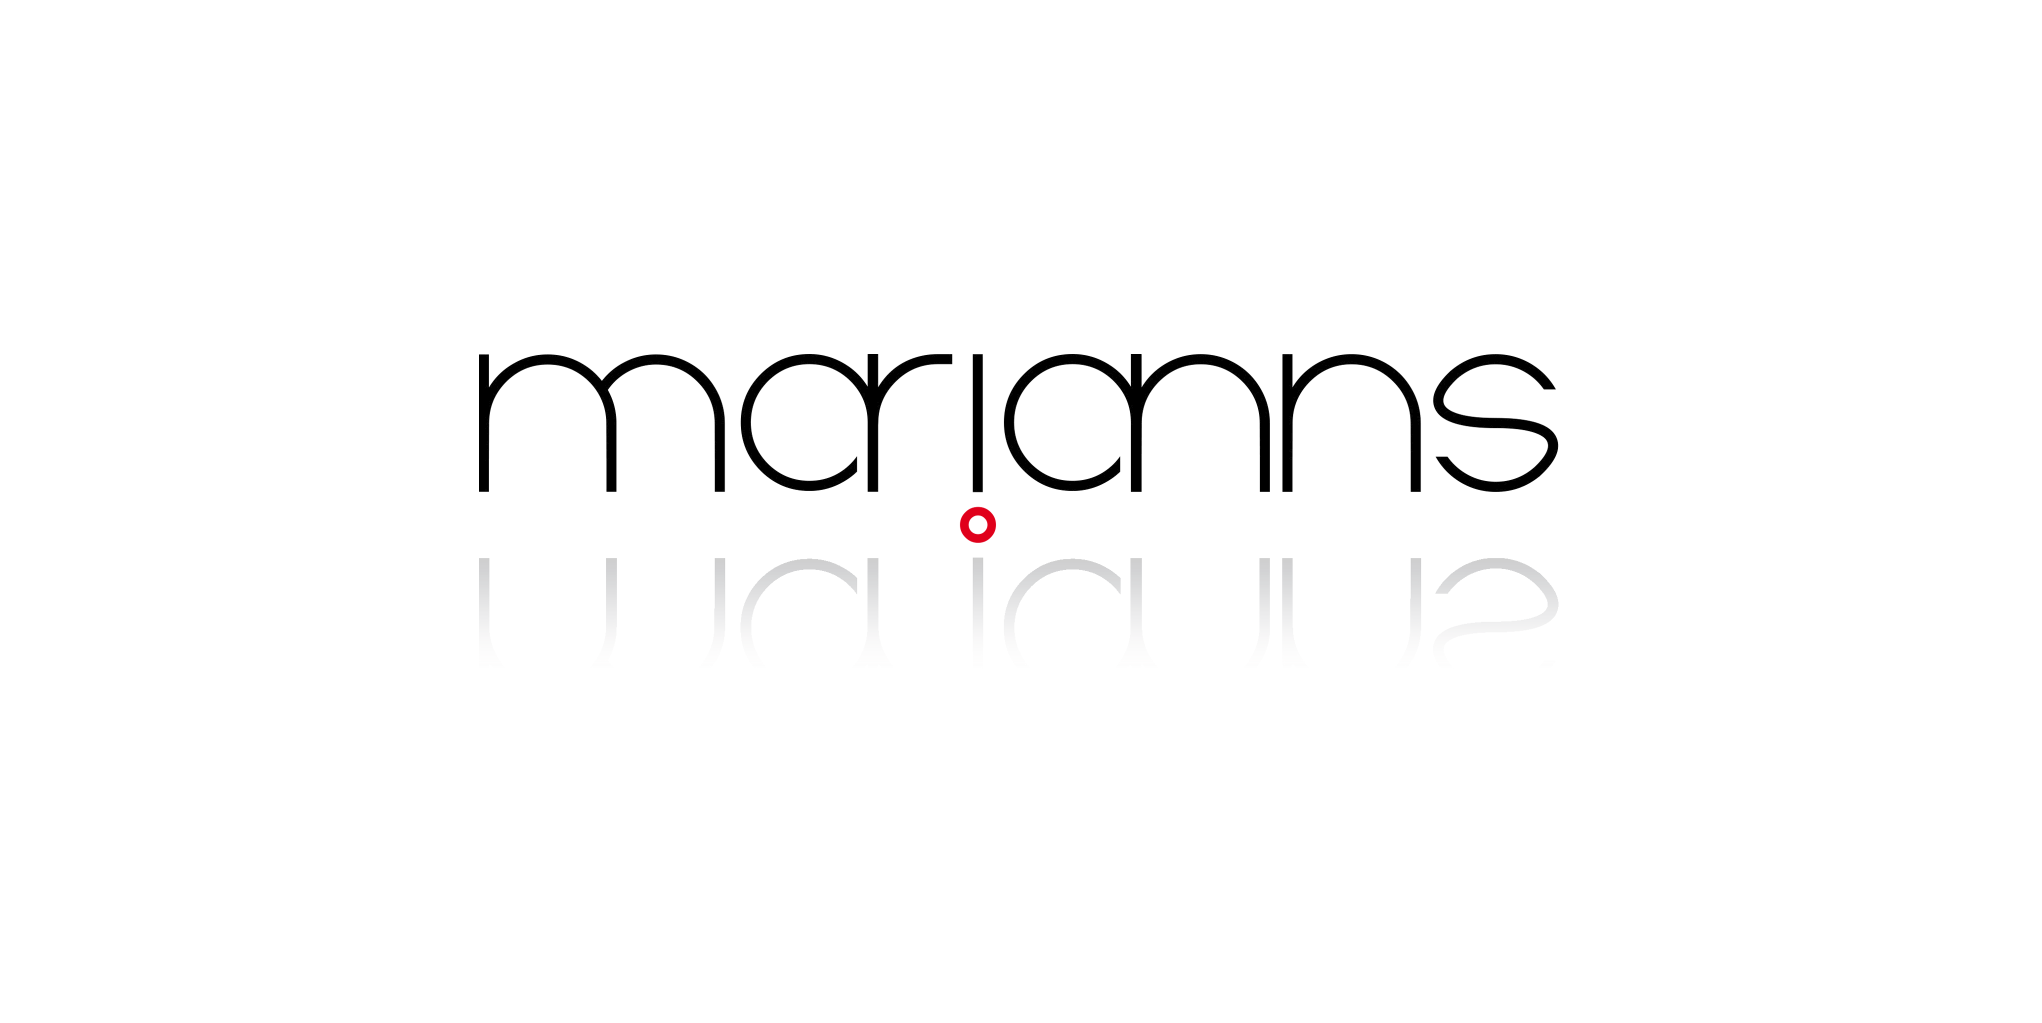 marianns logo 1.png